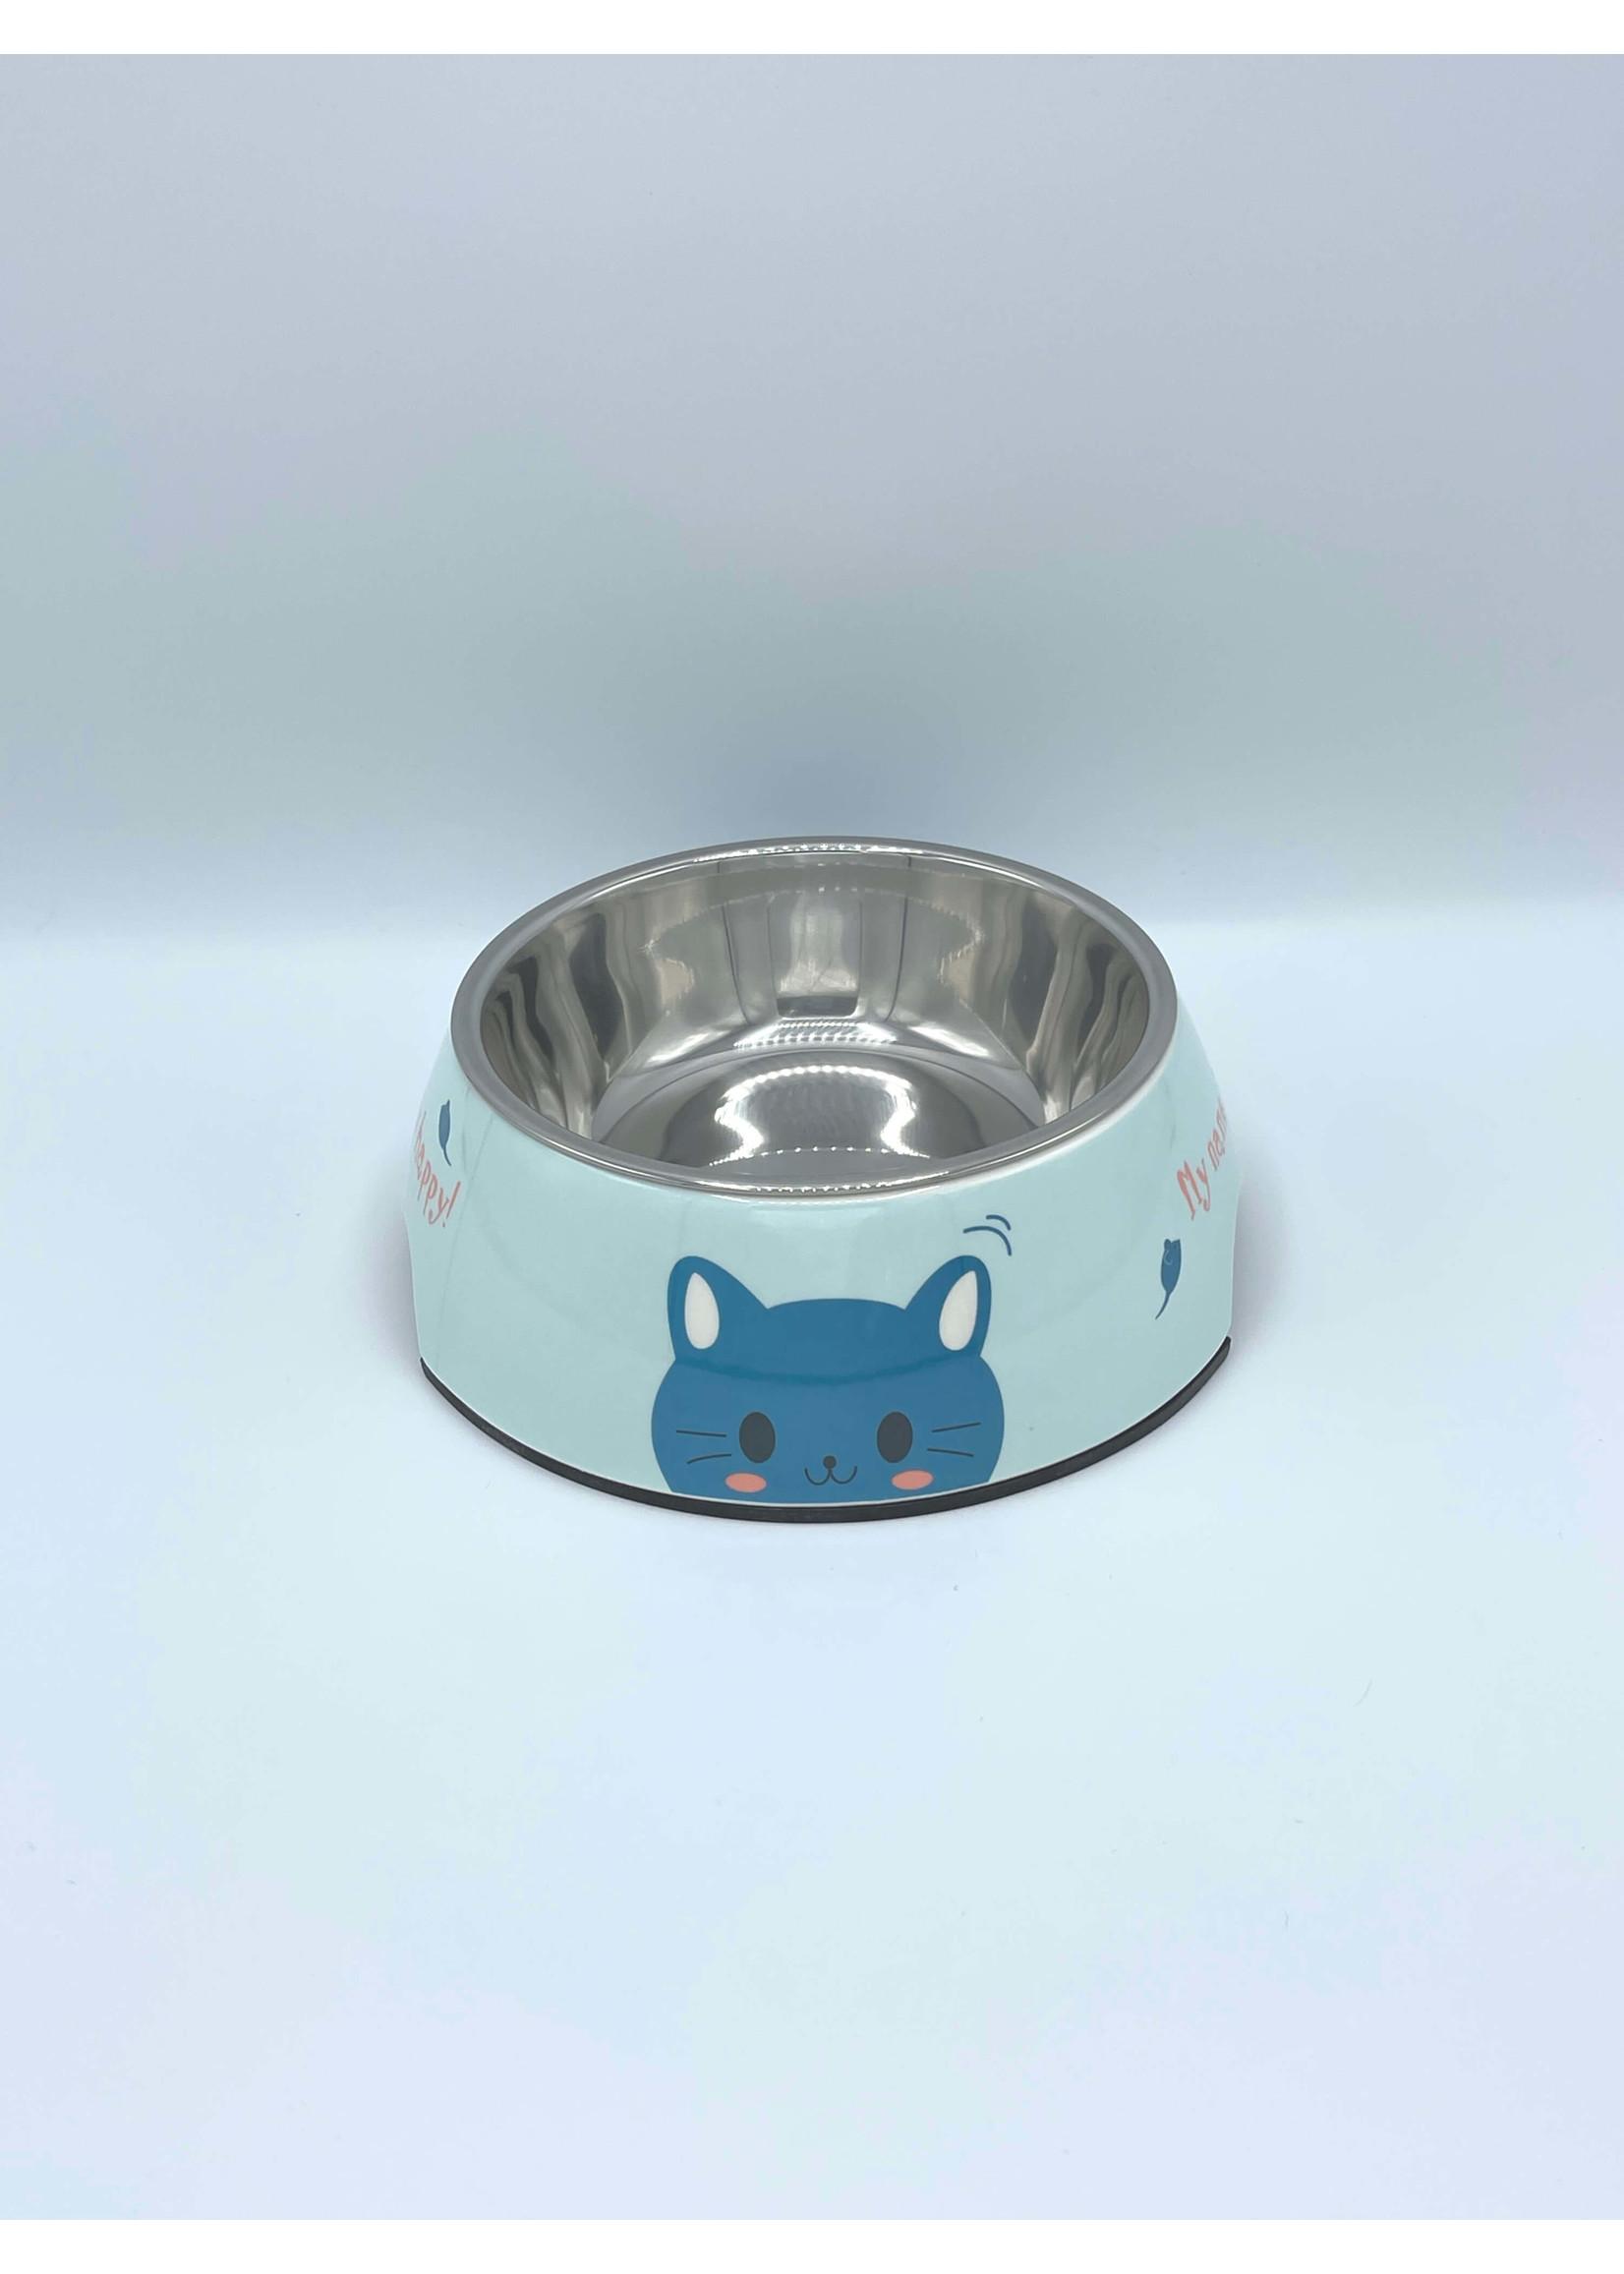 Stainless Steel Design Bowl